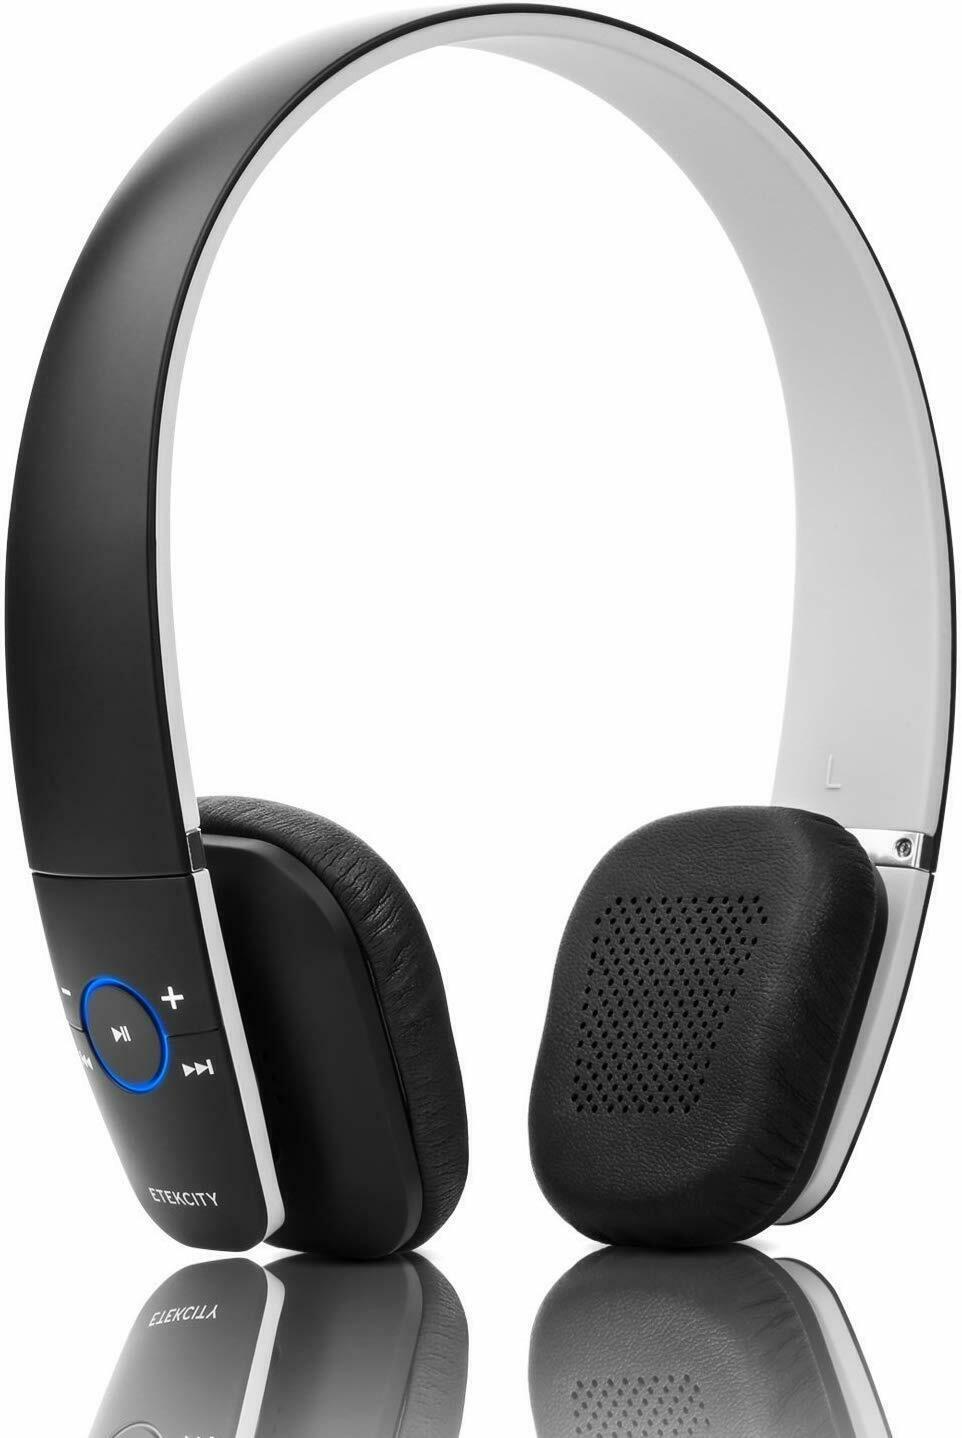 Etekcity RoverBeats F1 On Ear Wireless Bluetooth 4.0+EDR Headphones